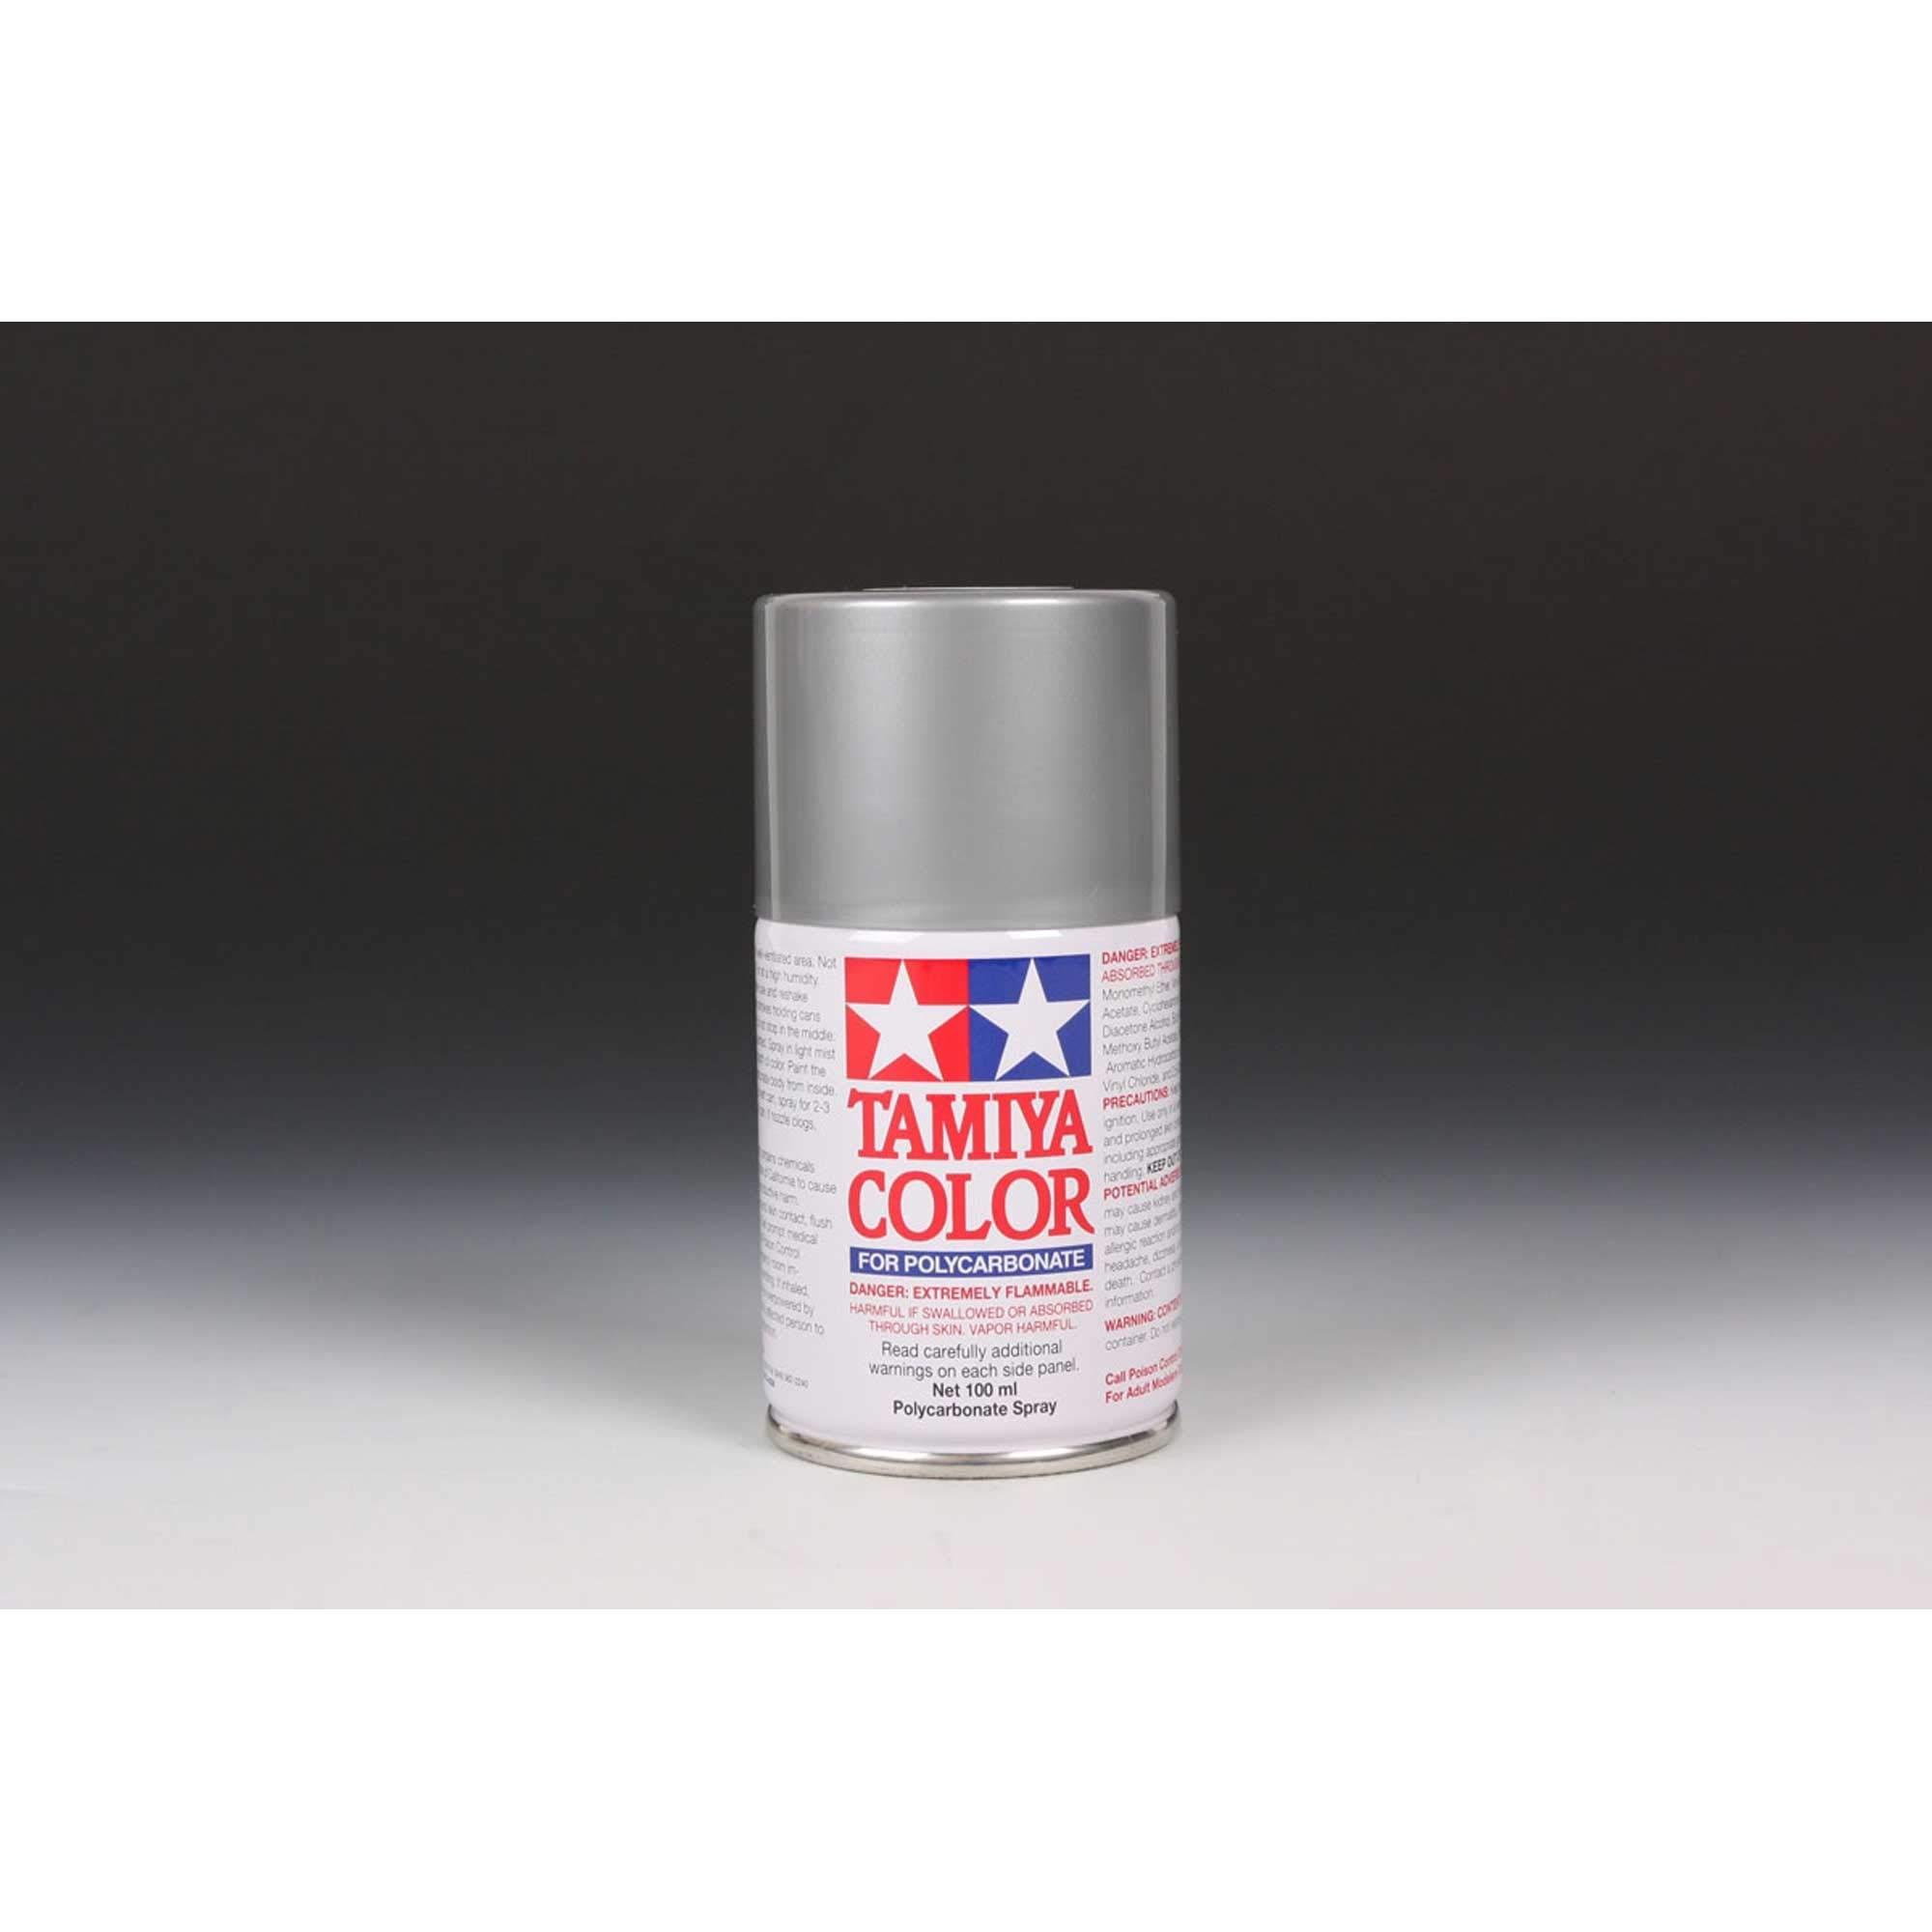 Tamiya 86012 Paint Spray, Silver